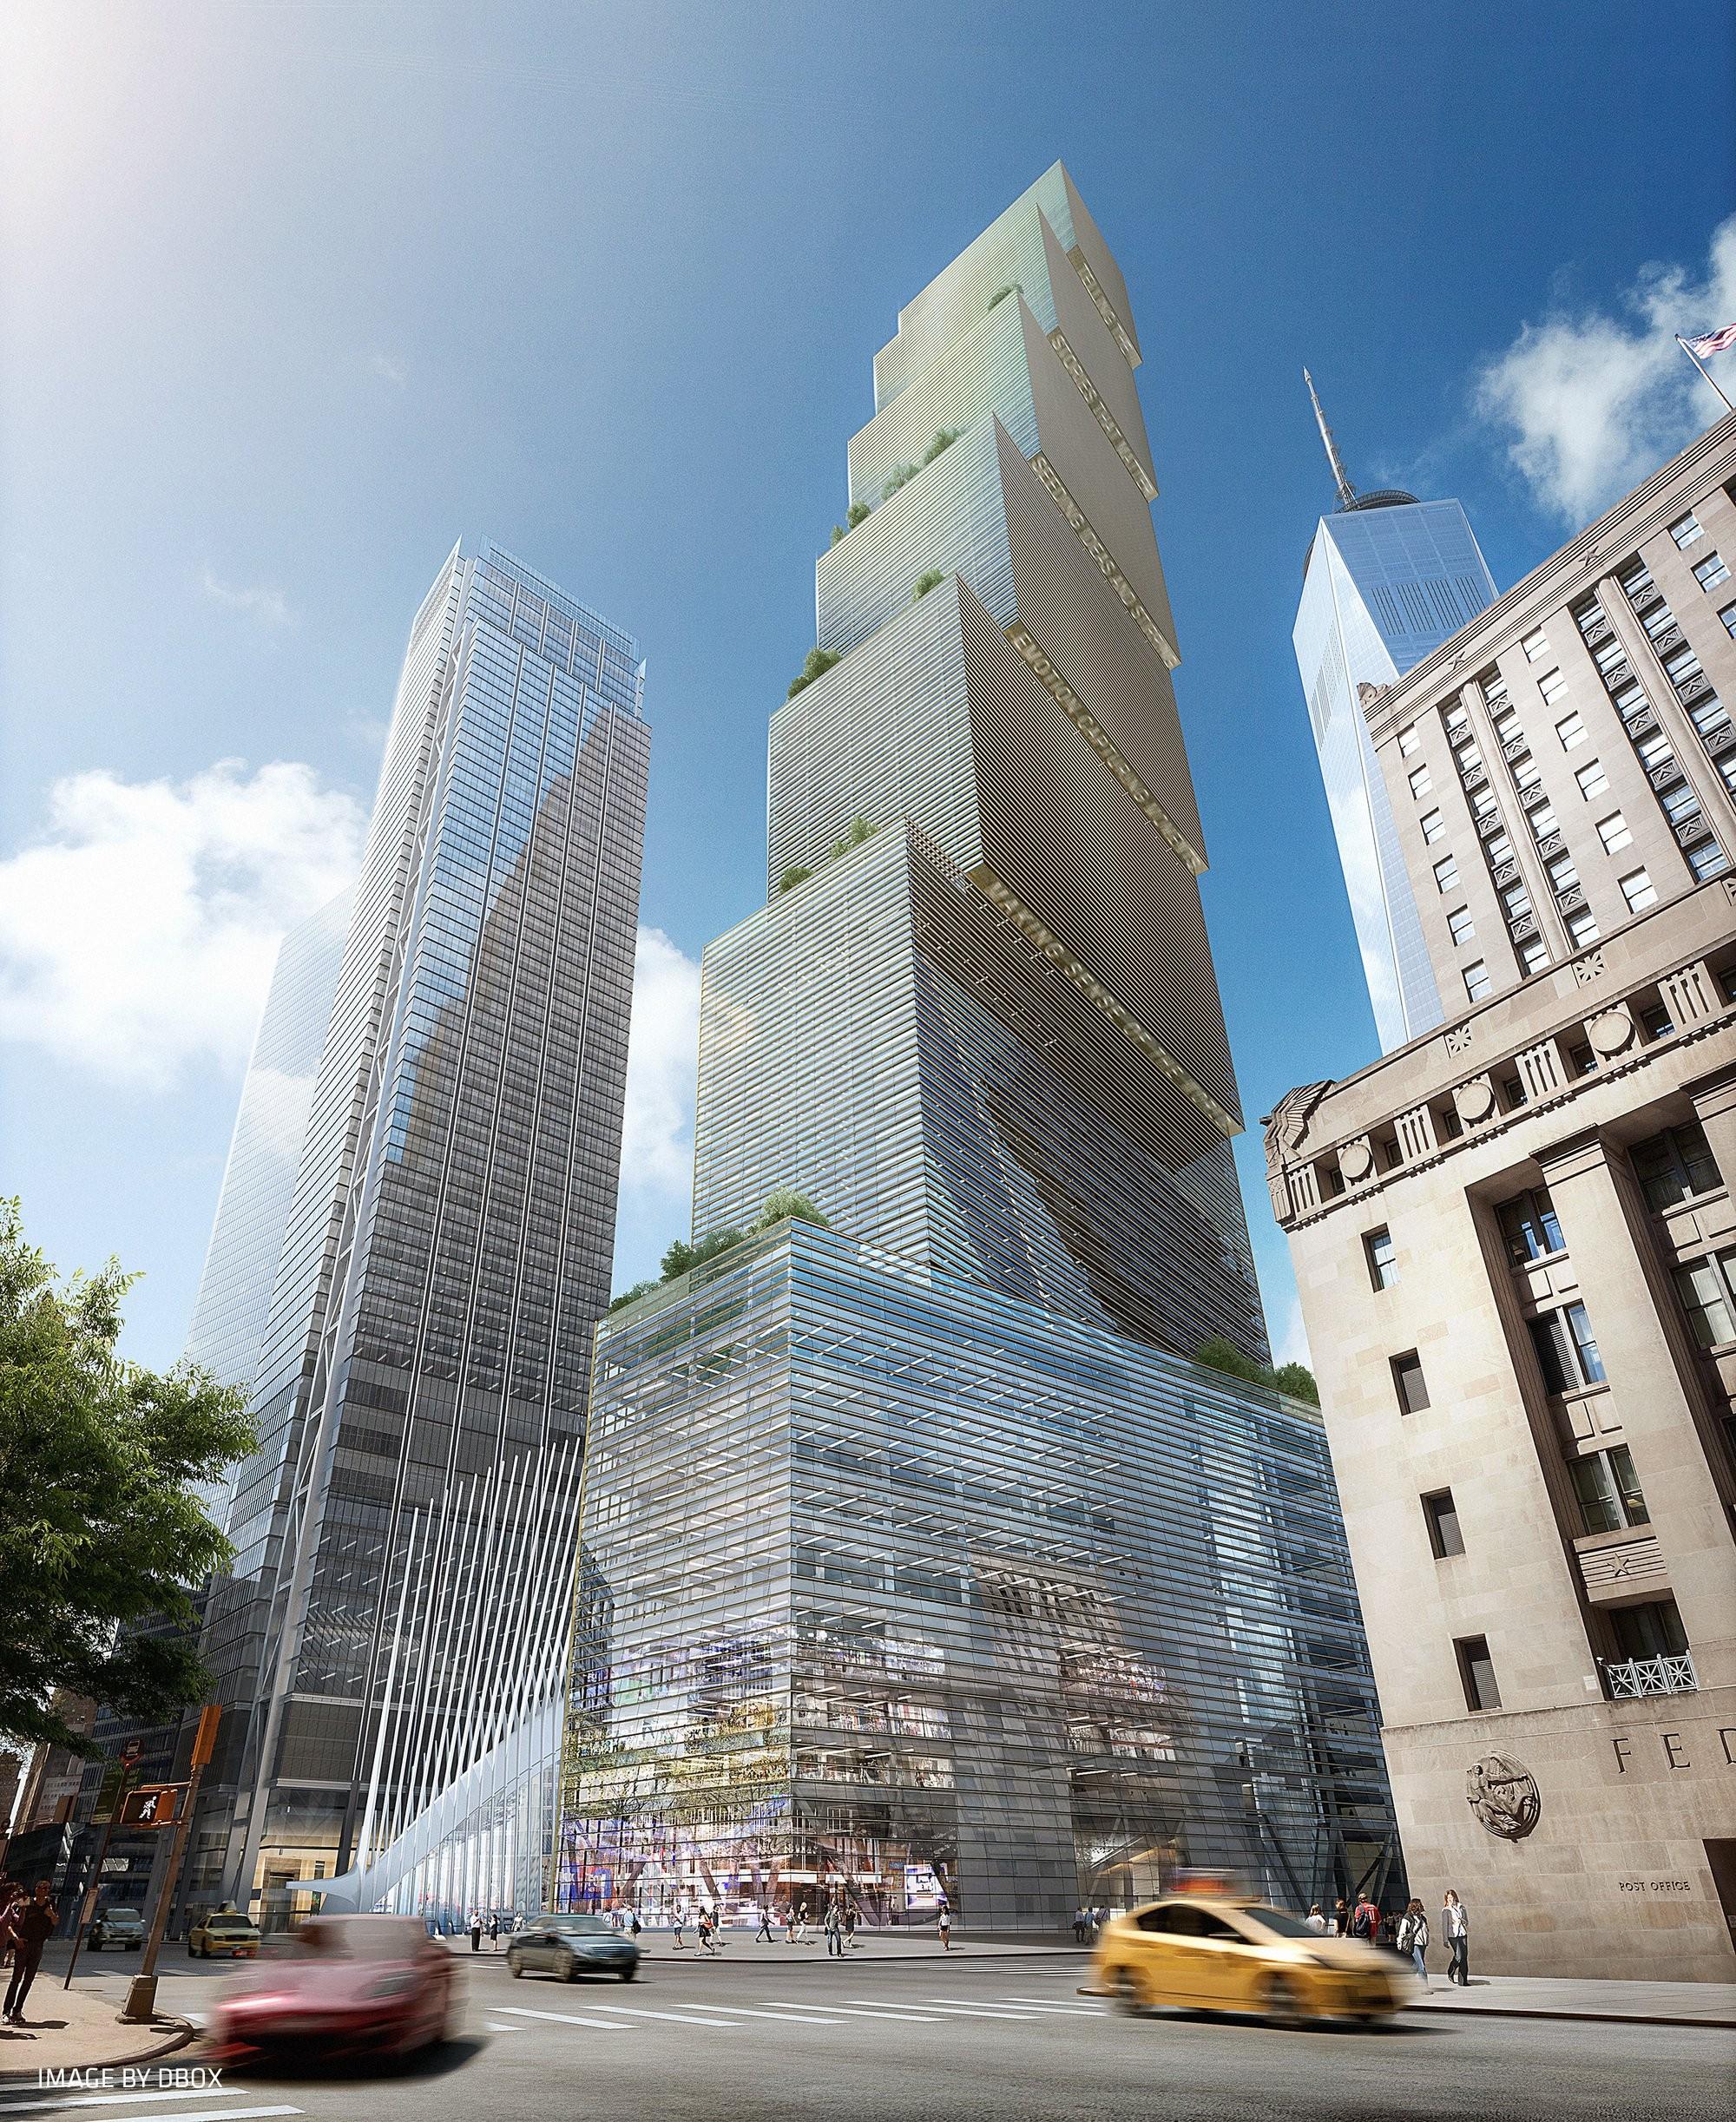 Bjarke Ingels Talks About Two World Trade Center